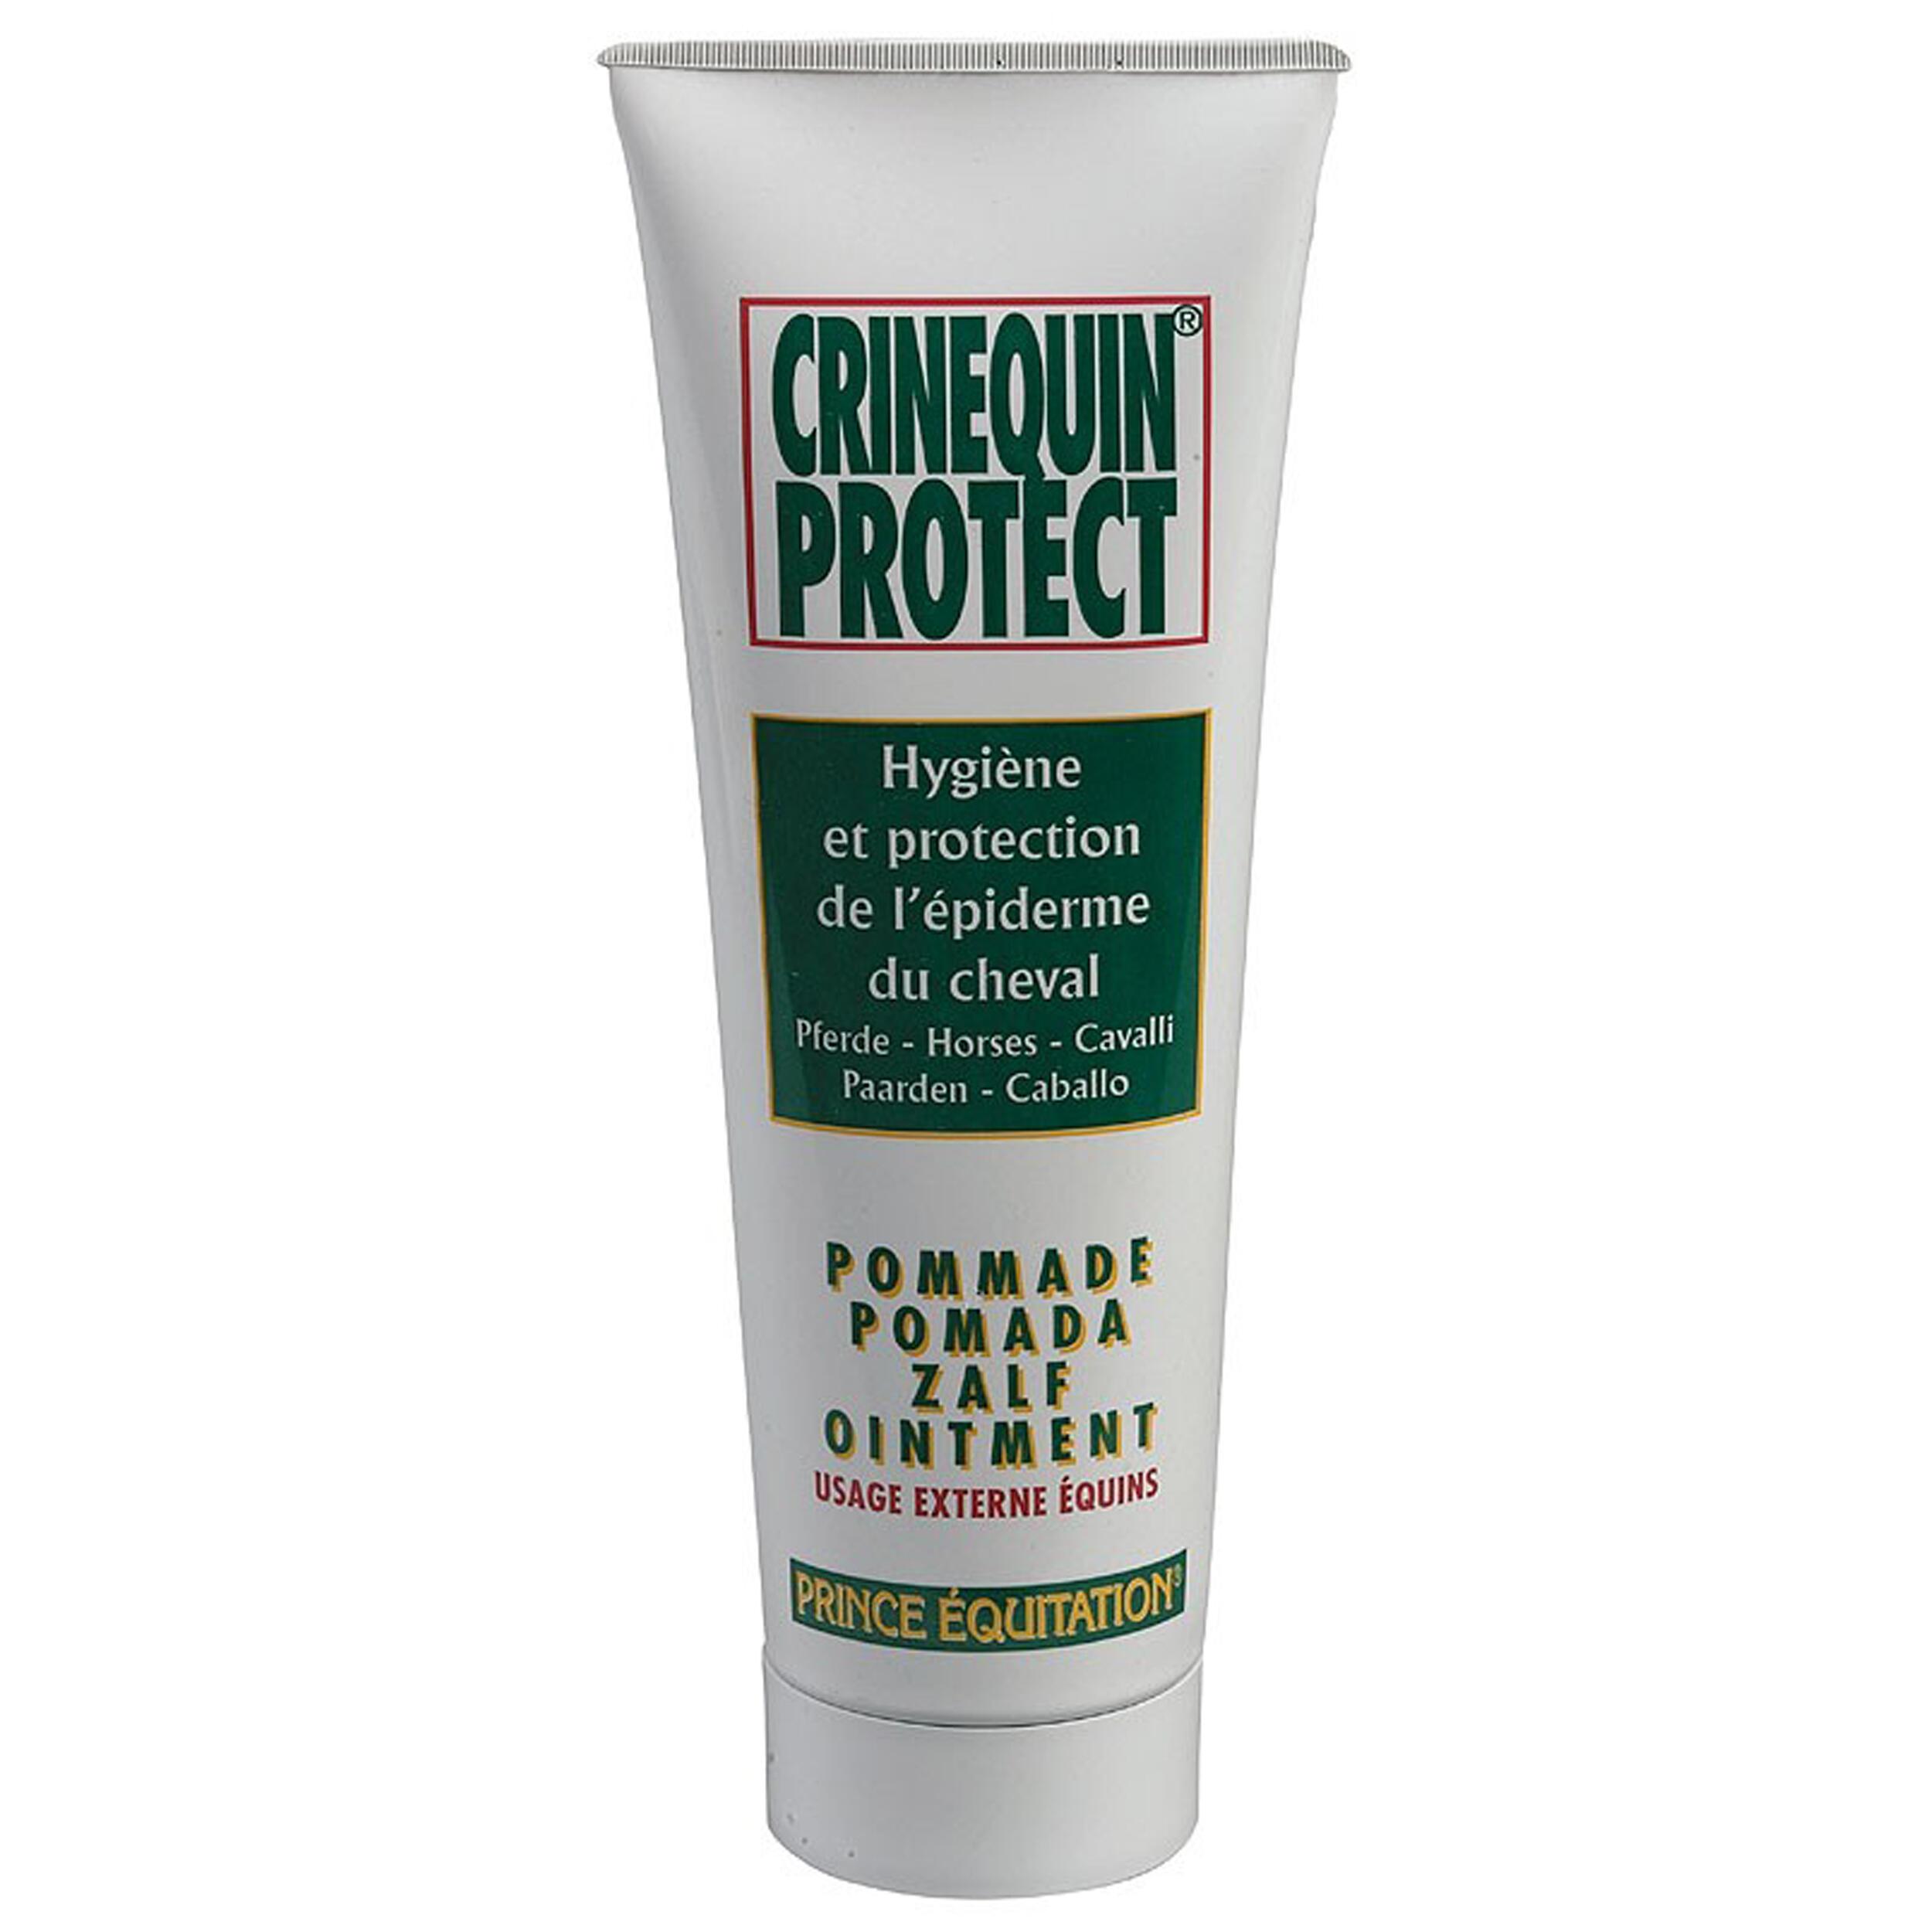 Cremă Crinequin Protect 200g